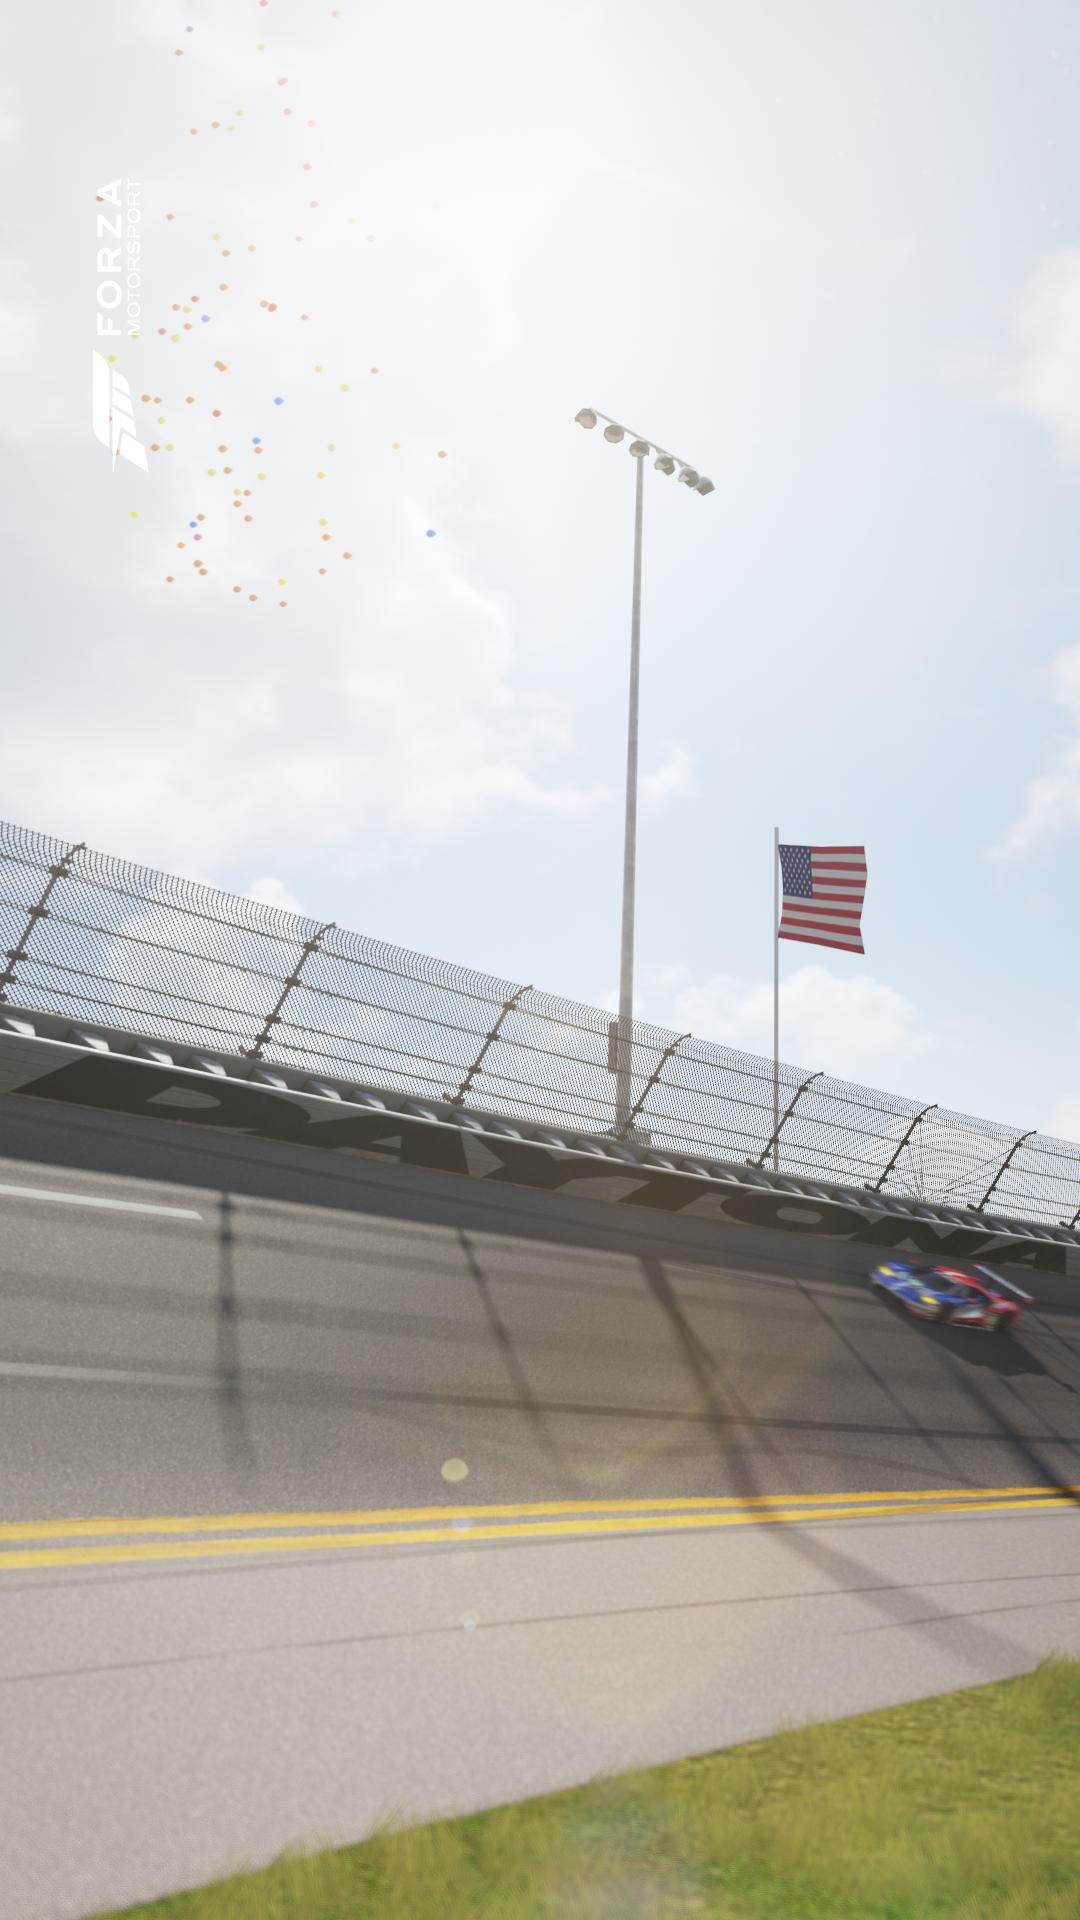 Forza Motorsport 6 (37).png